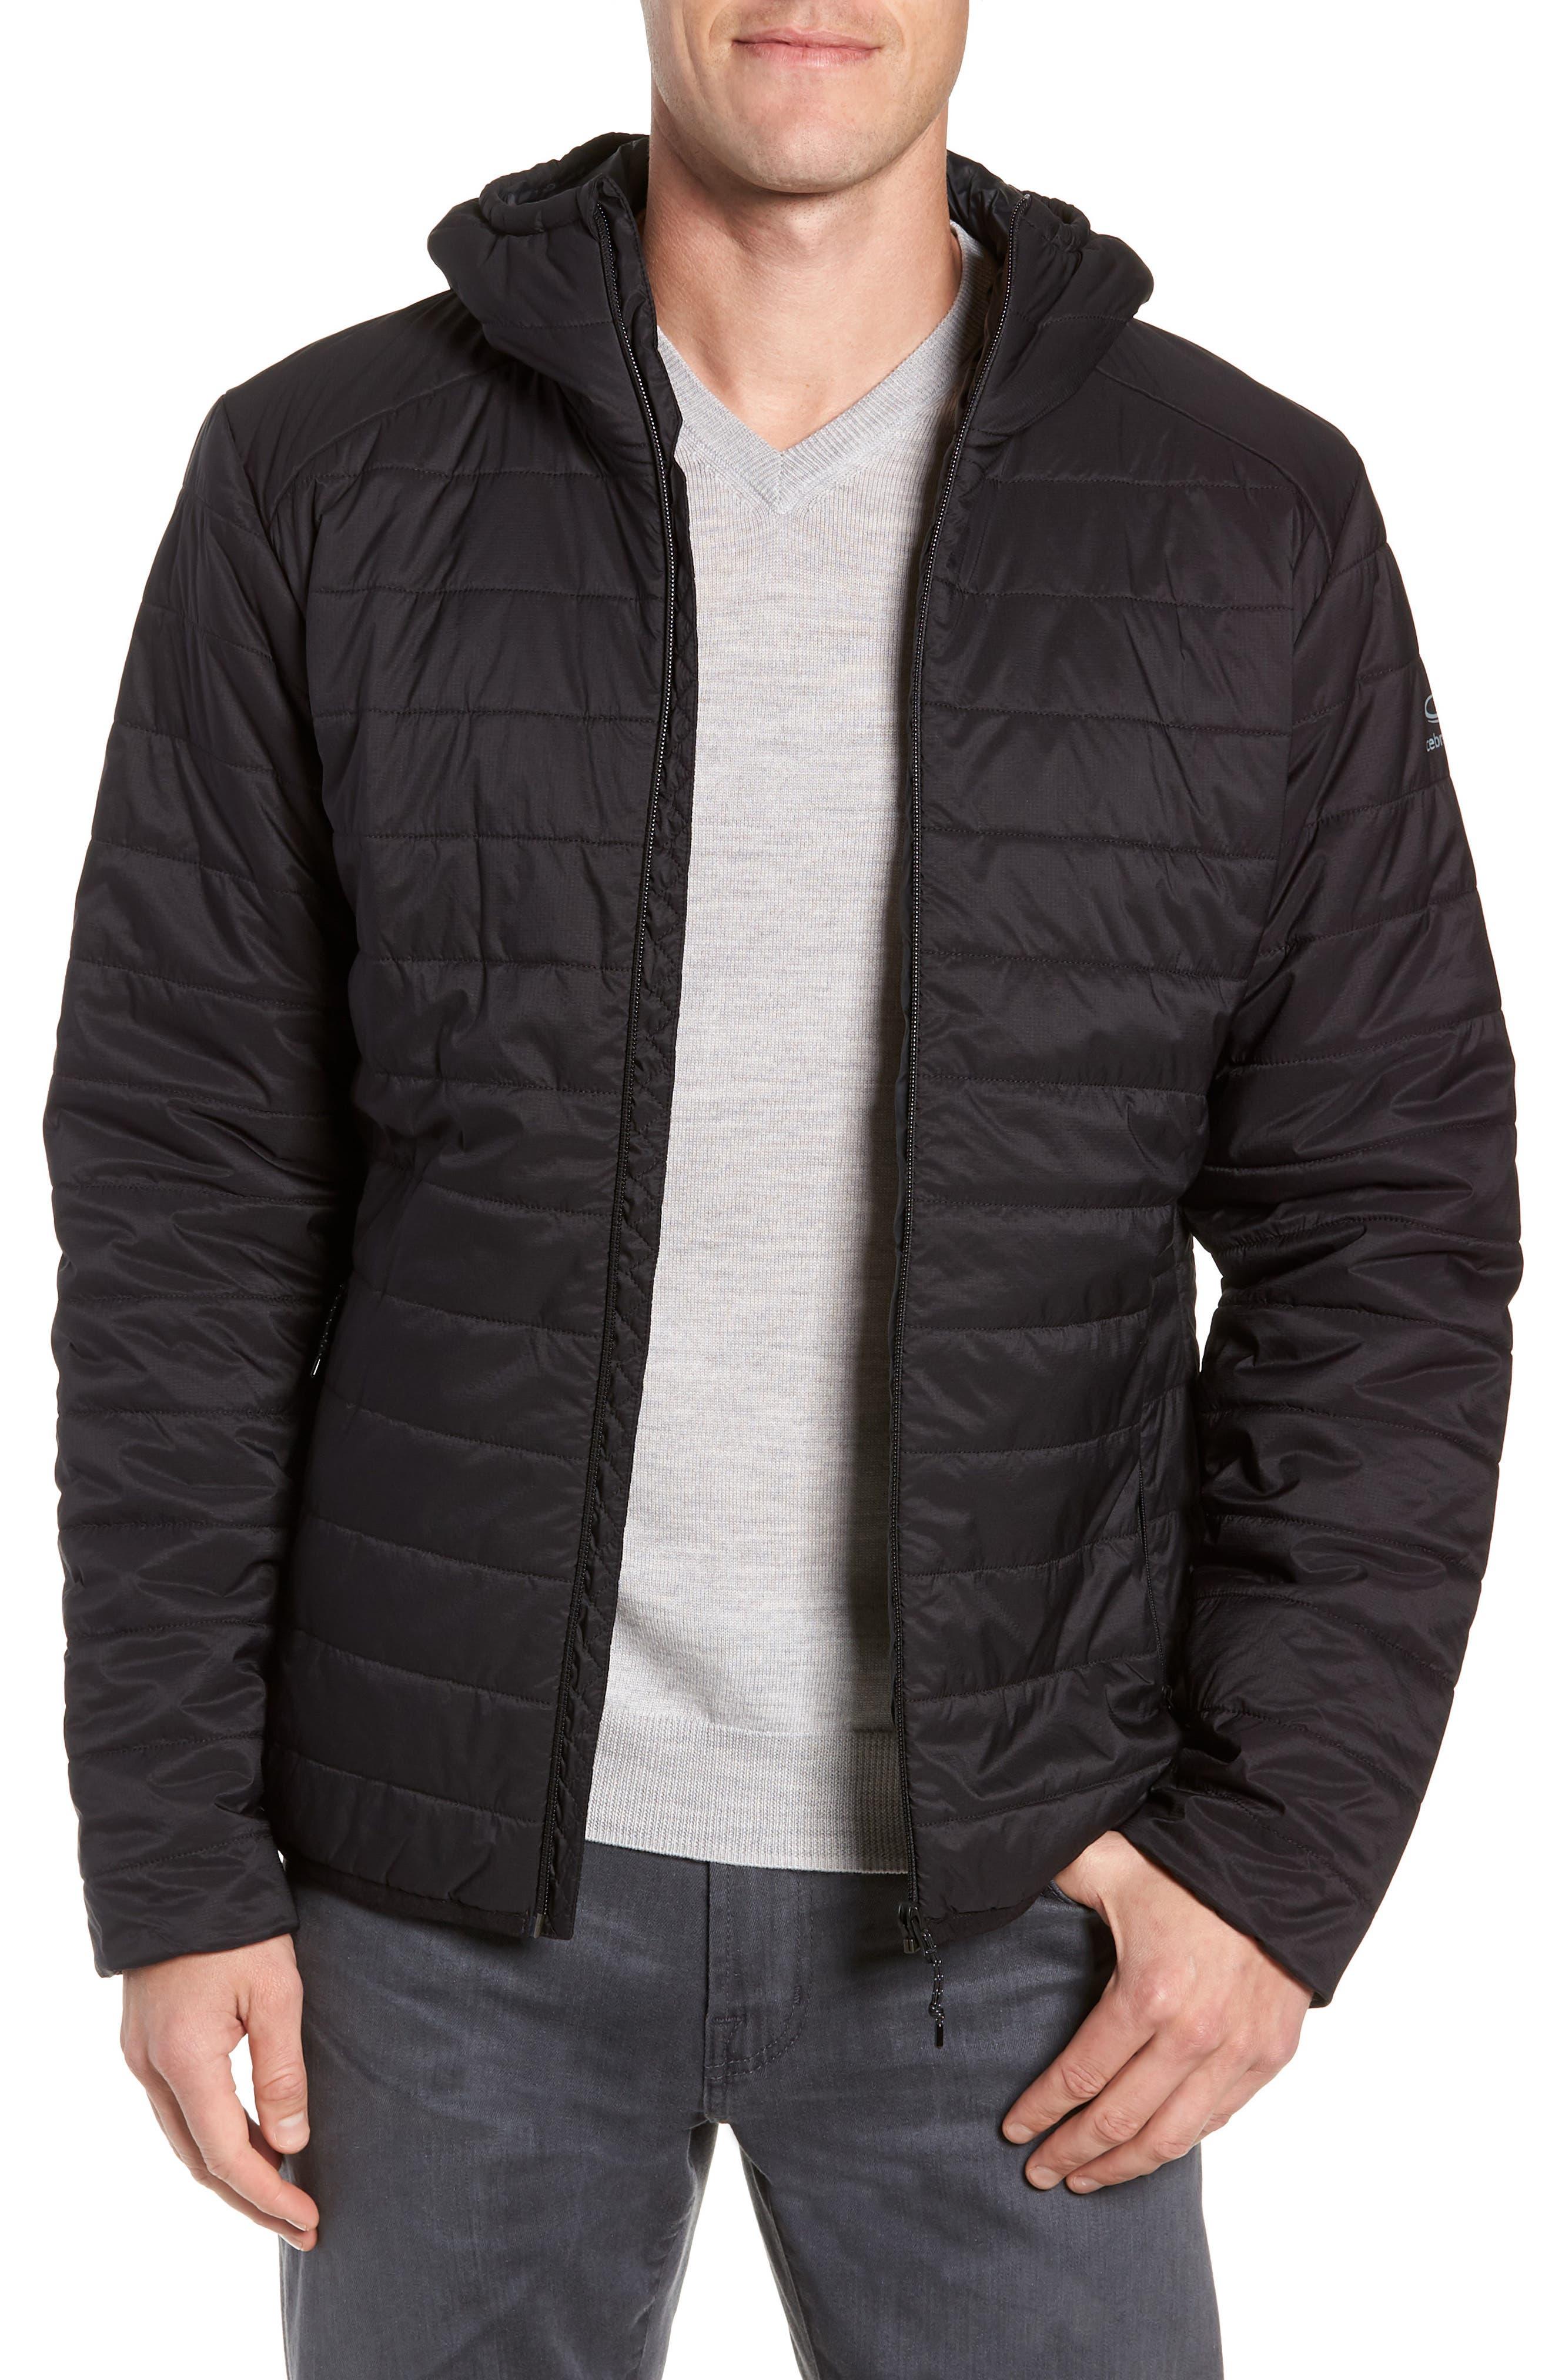 Hyperia MerinoLOFT<sup>™</sup> Hooded Jacket,                             Main thumbnail 1, color,                             BLACK